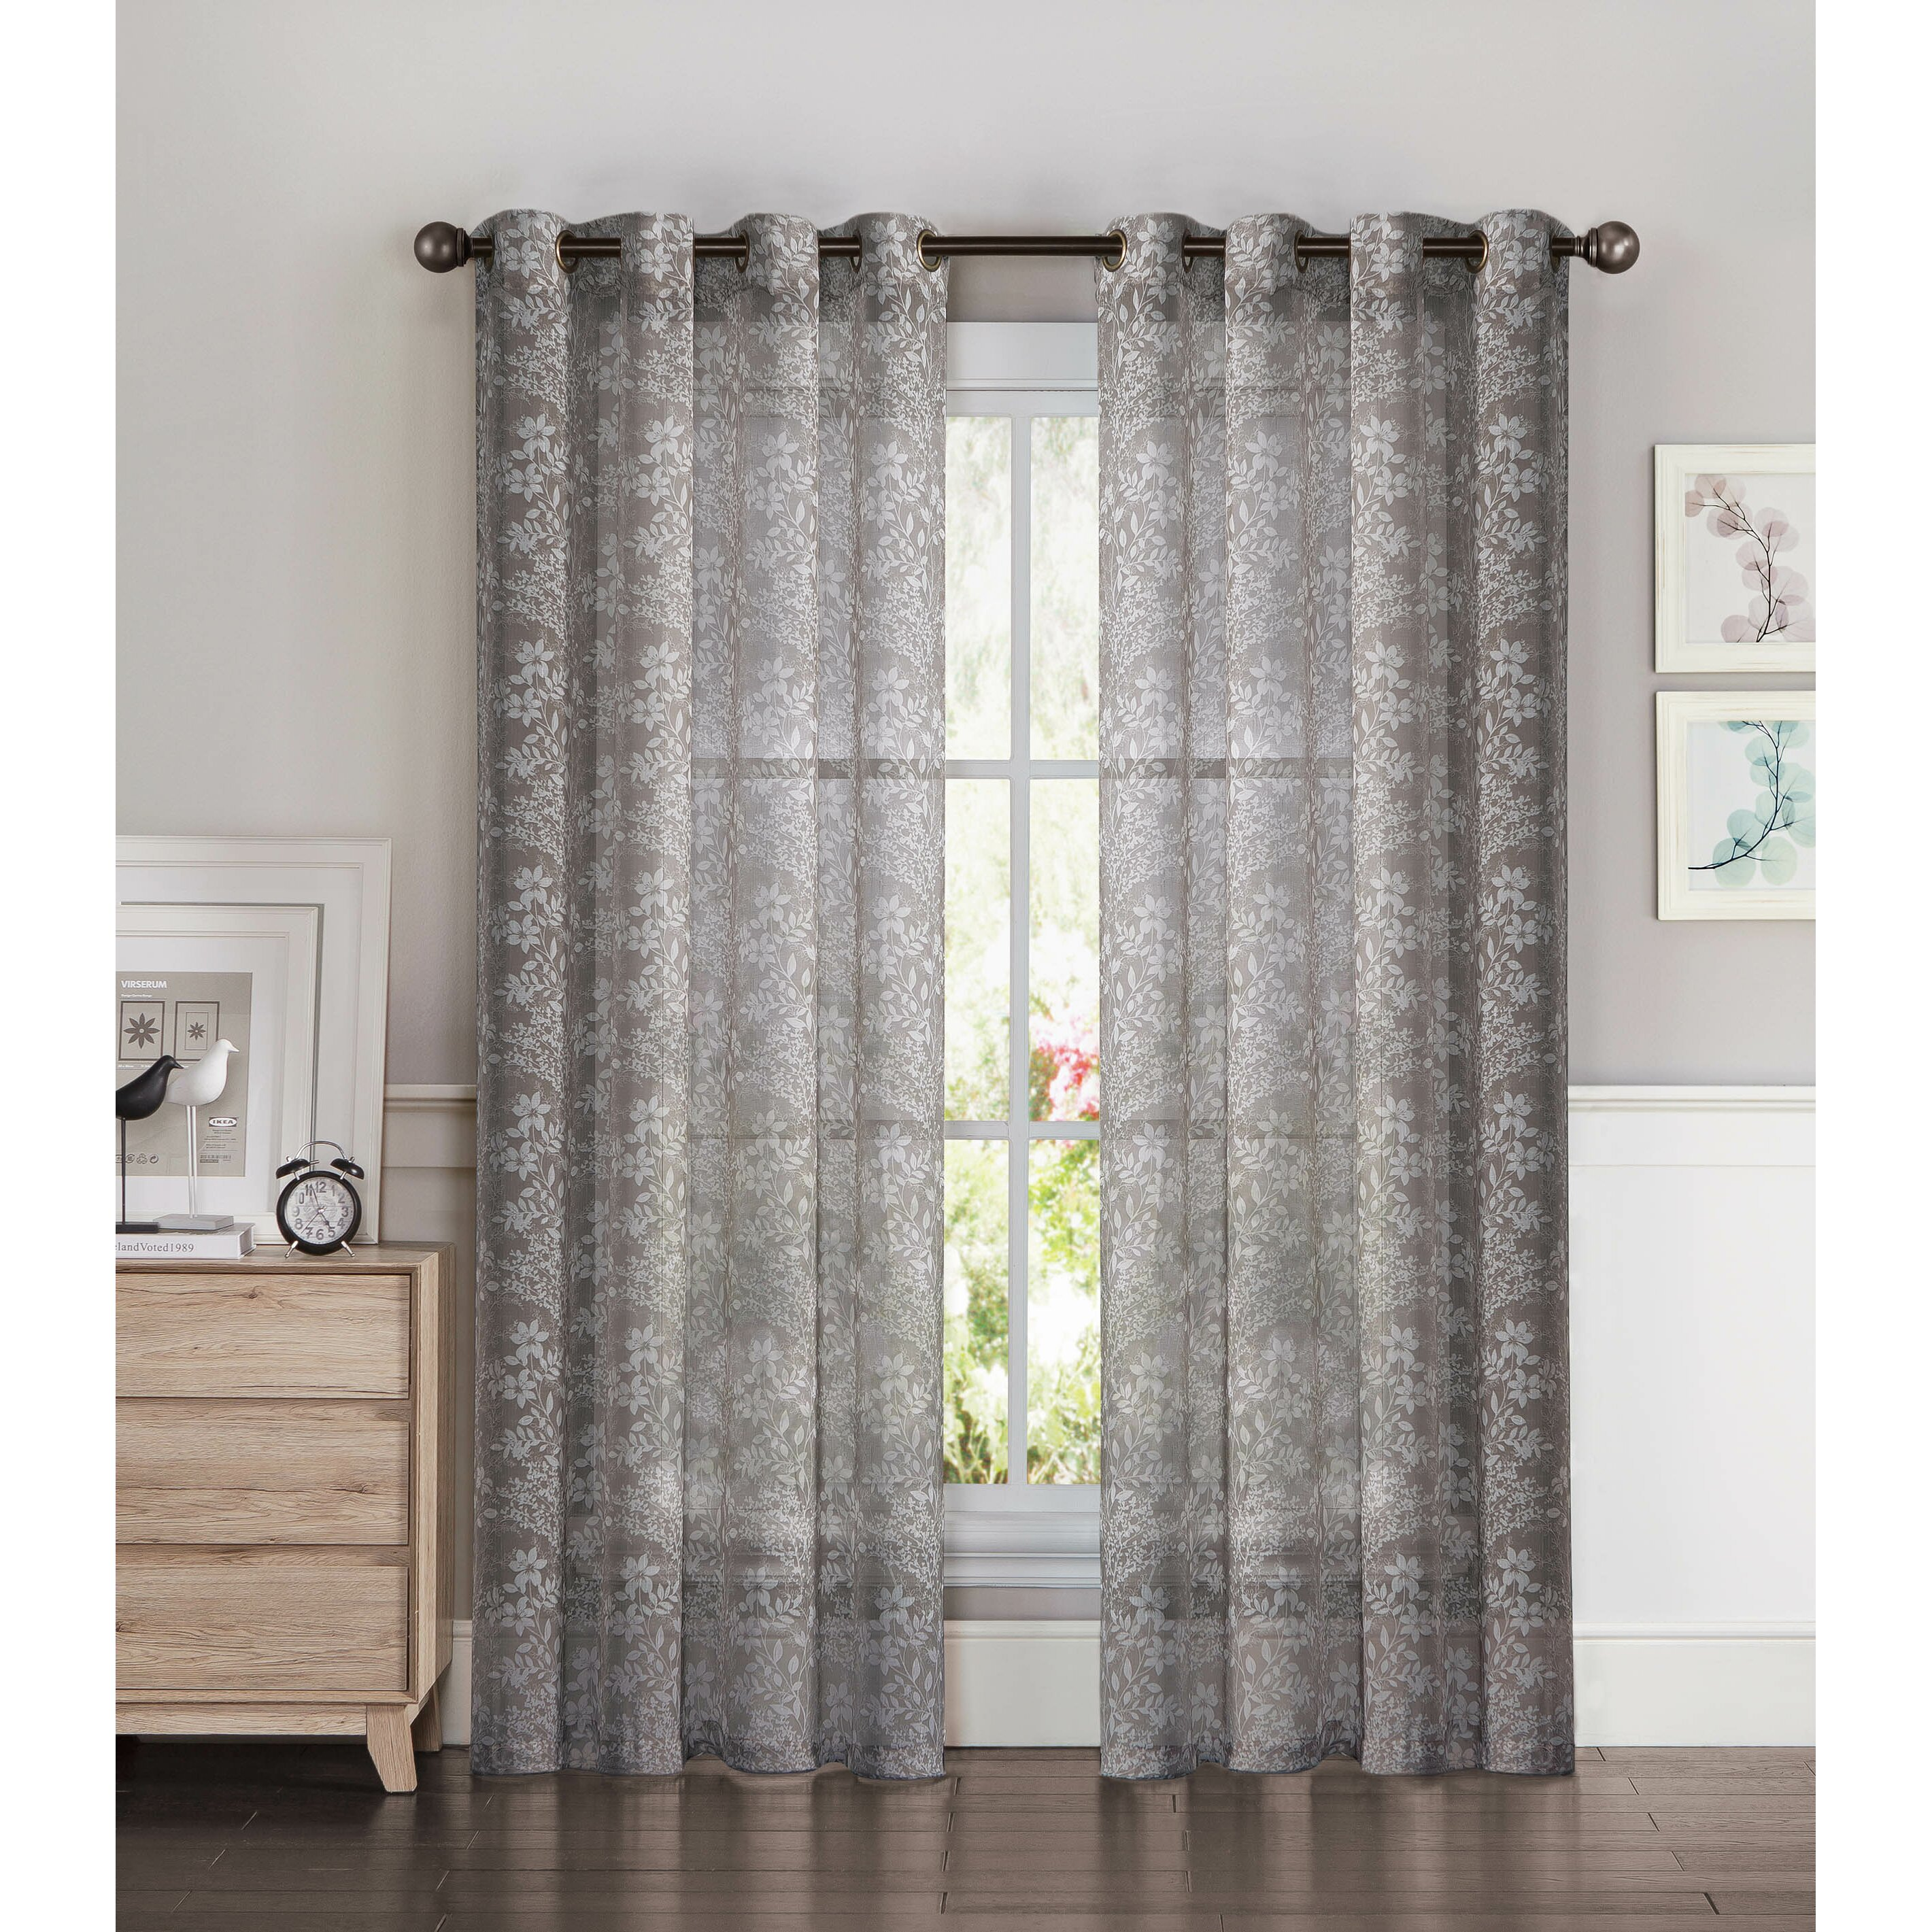 Window Elements Garden Semi Sheer Extra Wide Grommet Single Curtain Panel Reviews Wayfair